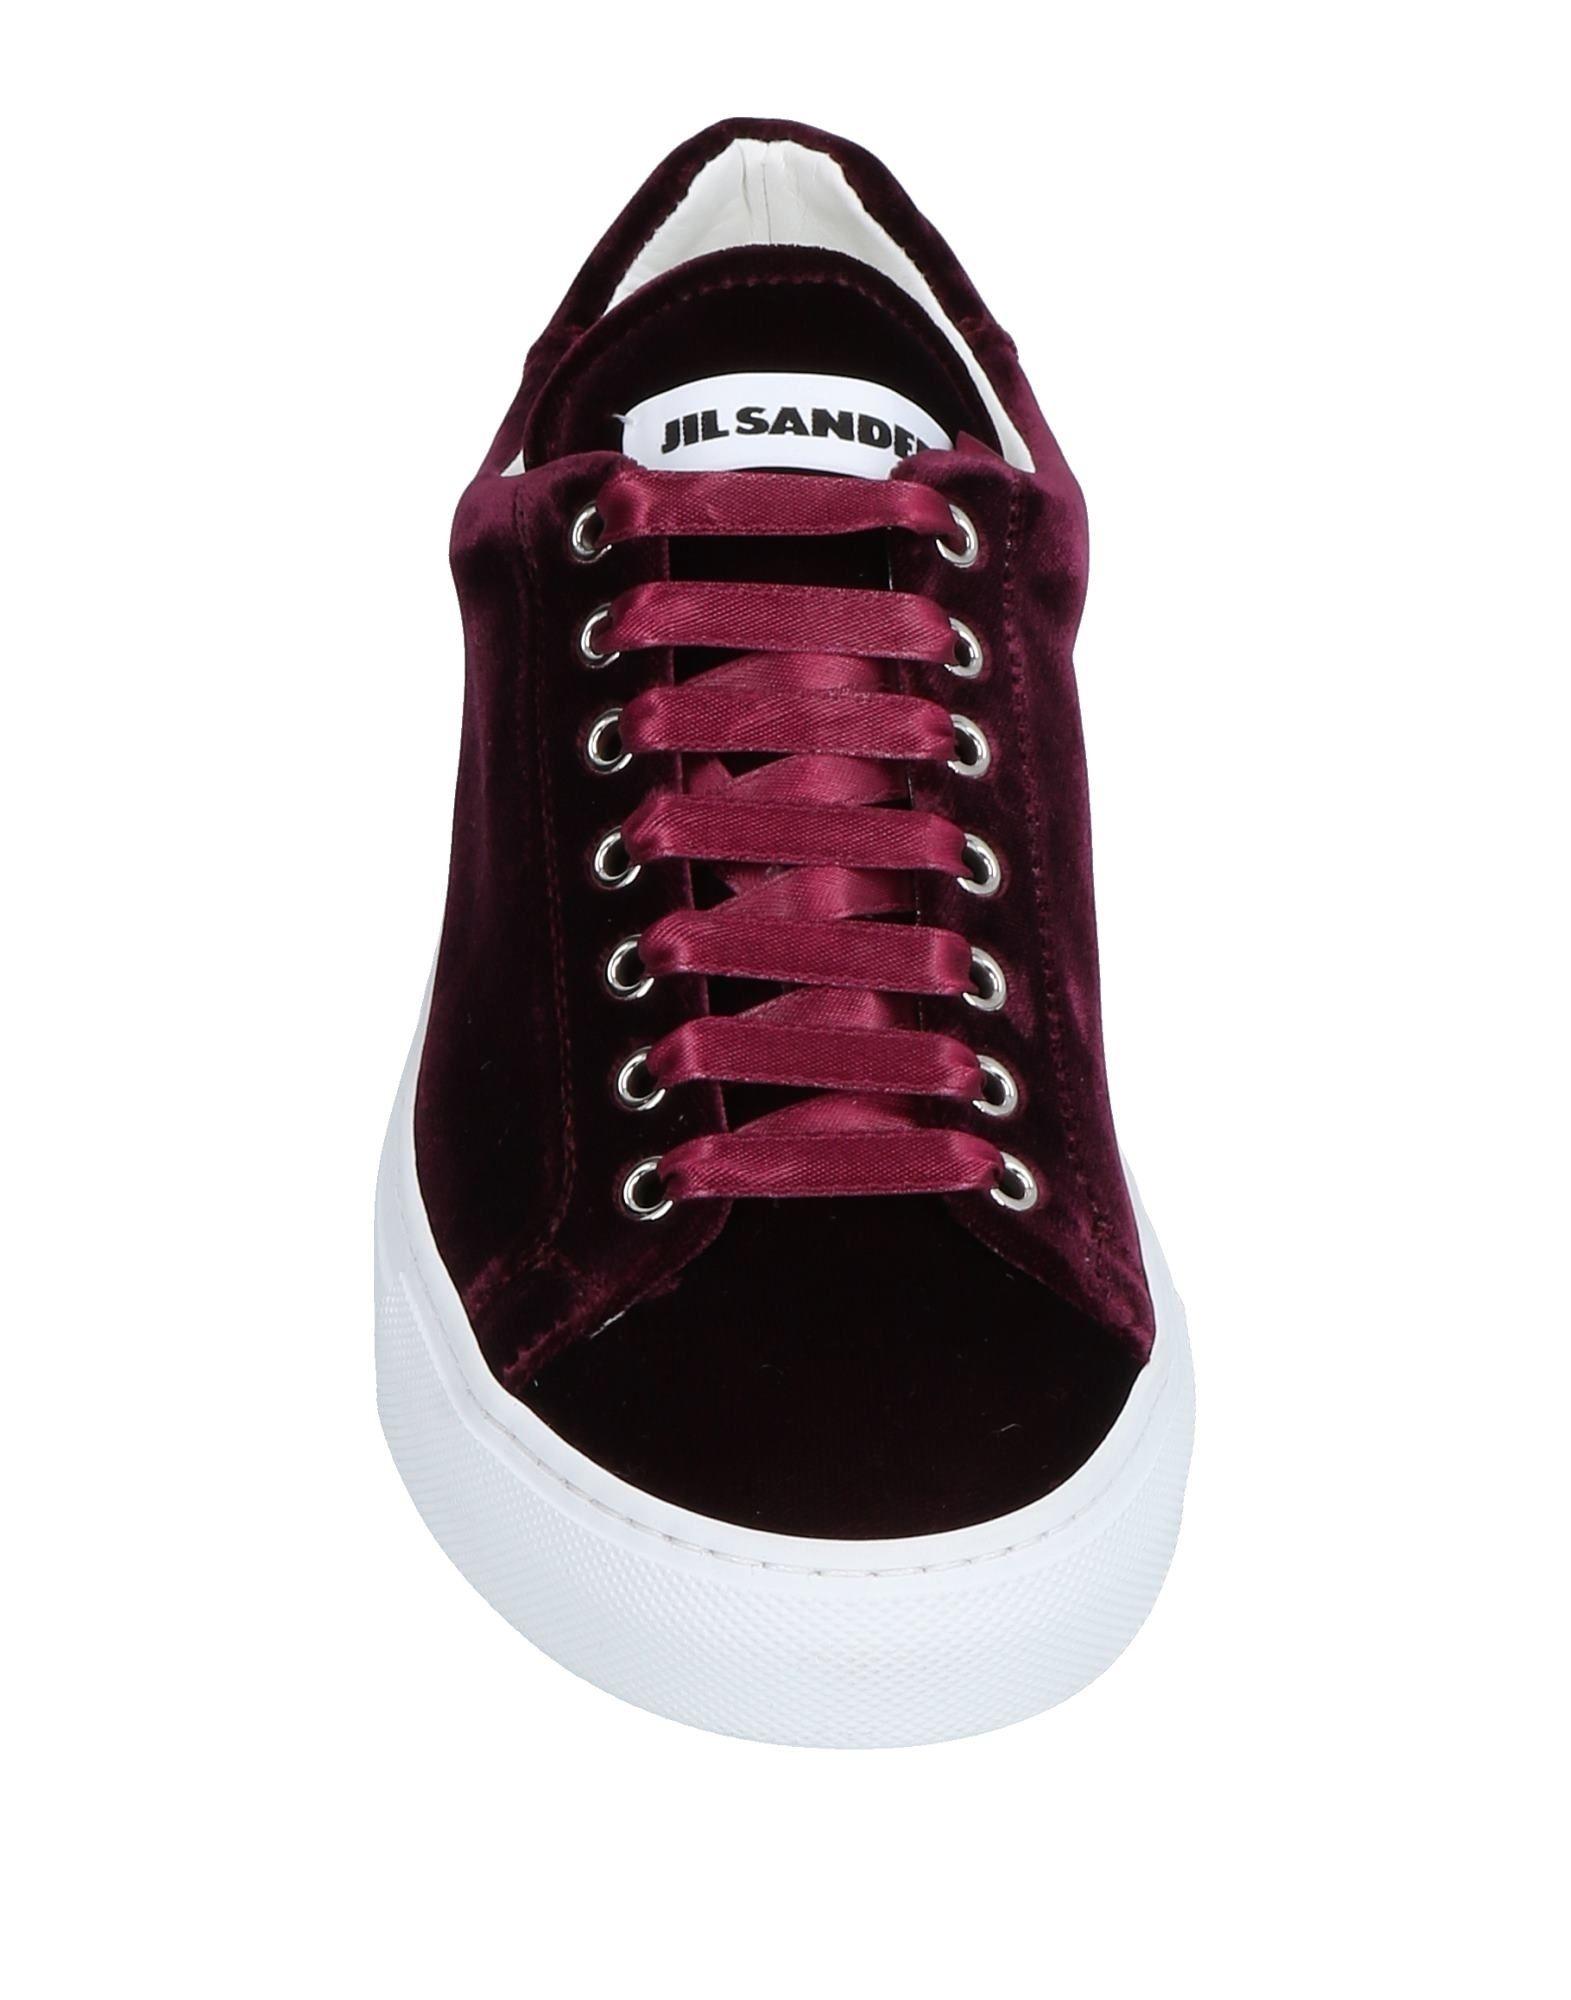 Rabatt Schuhe Jil Sander Sneakers Sneakers Sander Damen  11520924MW 2c8f96